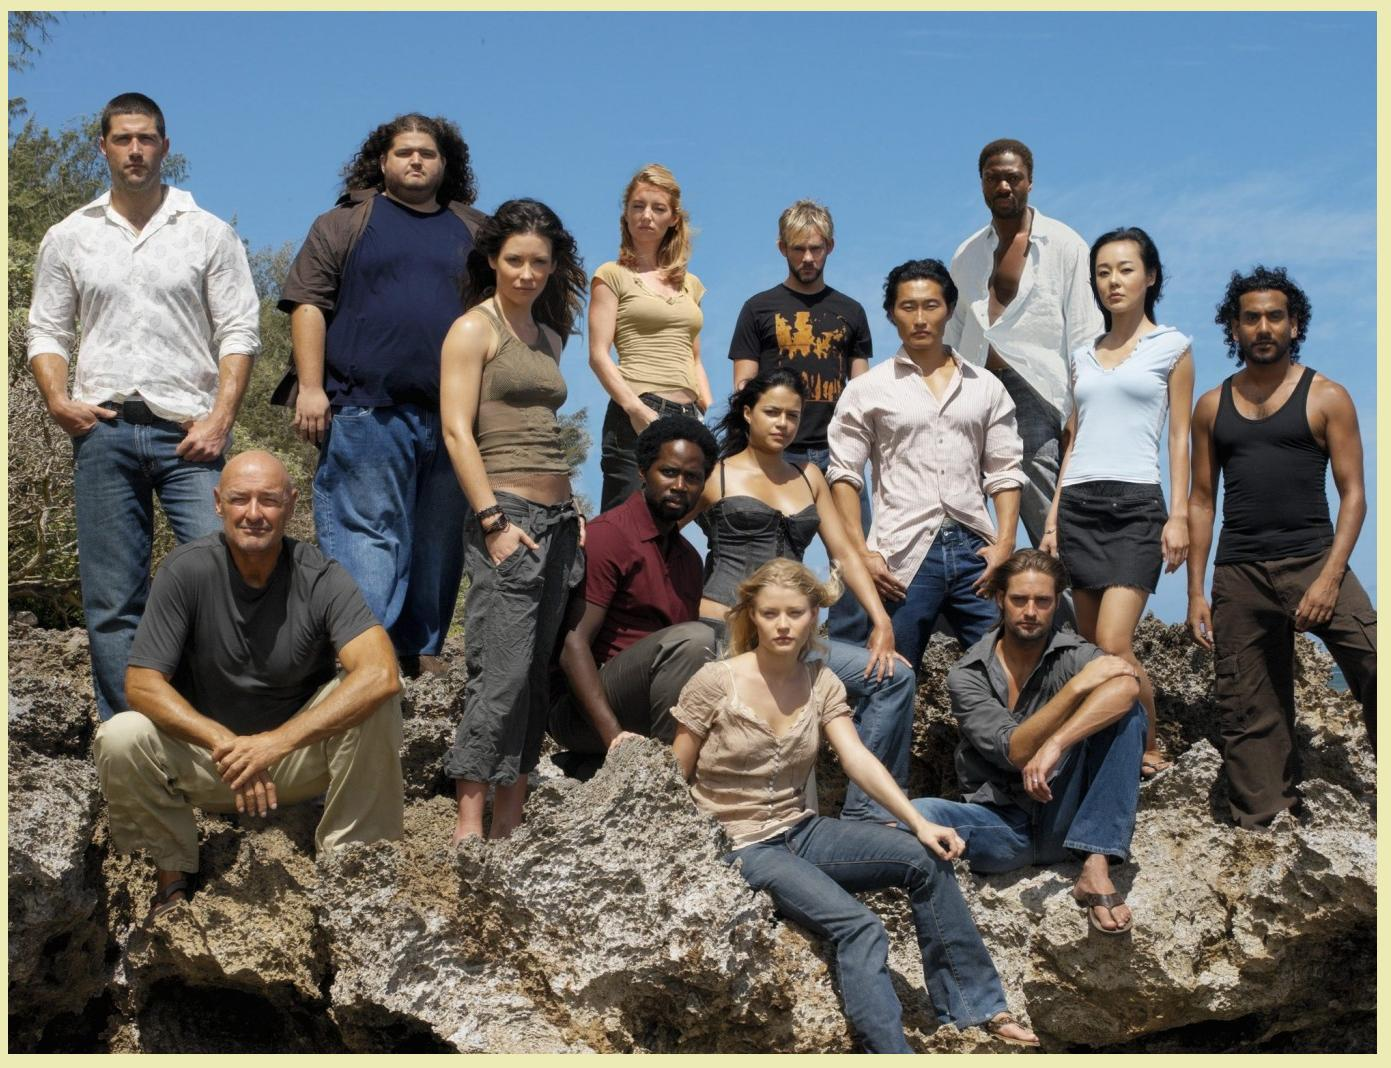 Hawaii 5-0 season 3 episode 2 promo : Yerra gulabi movie online